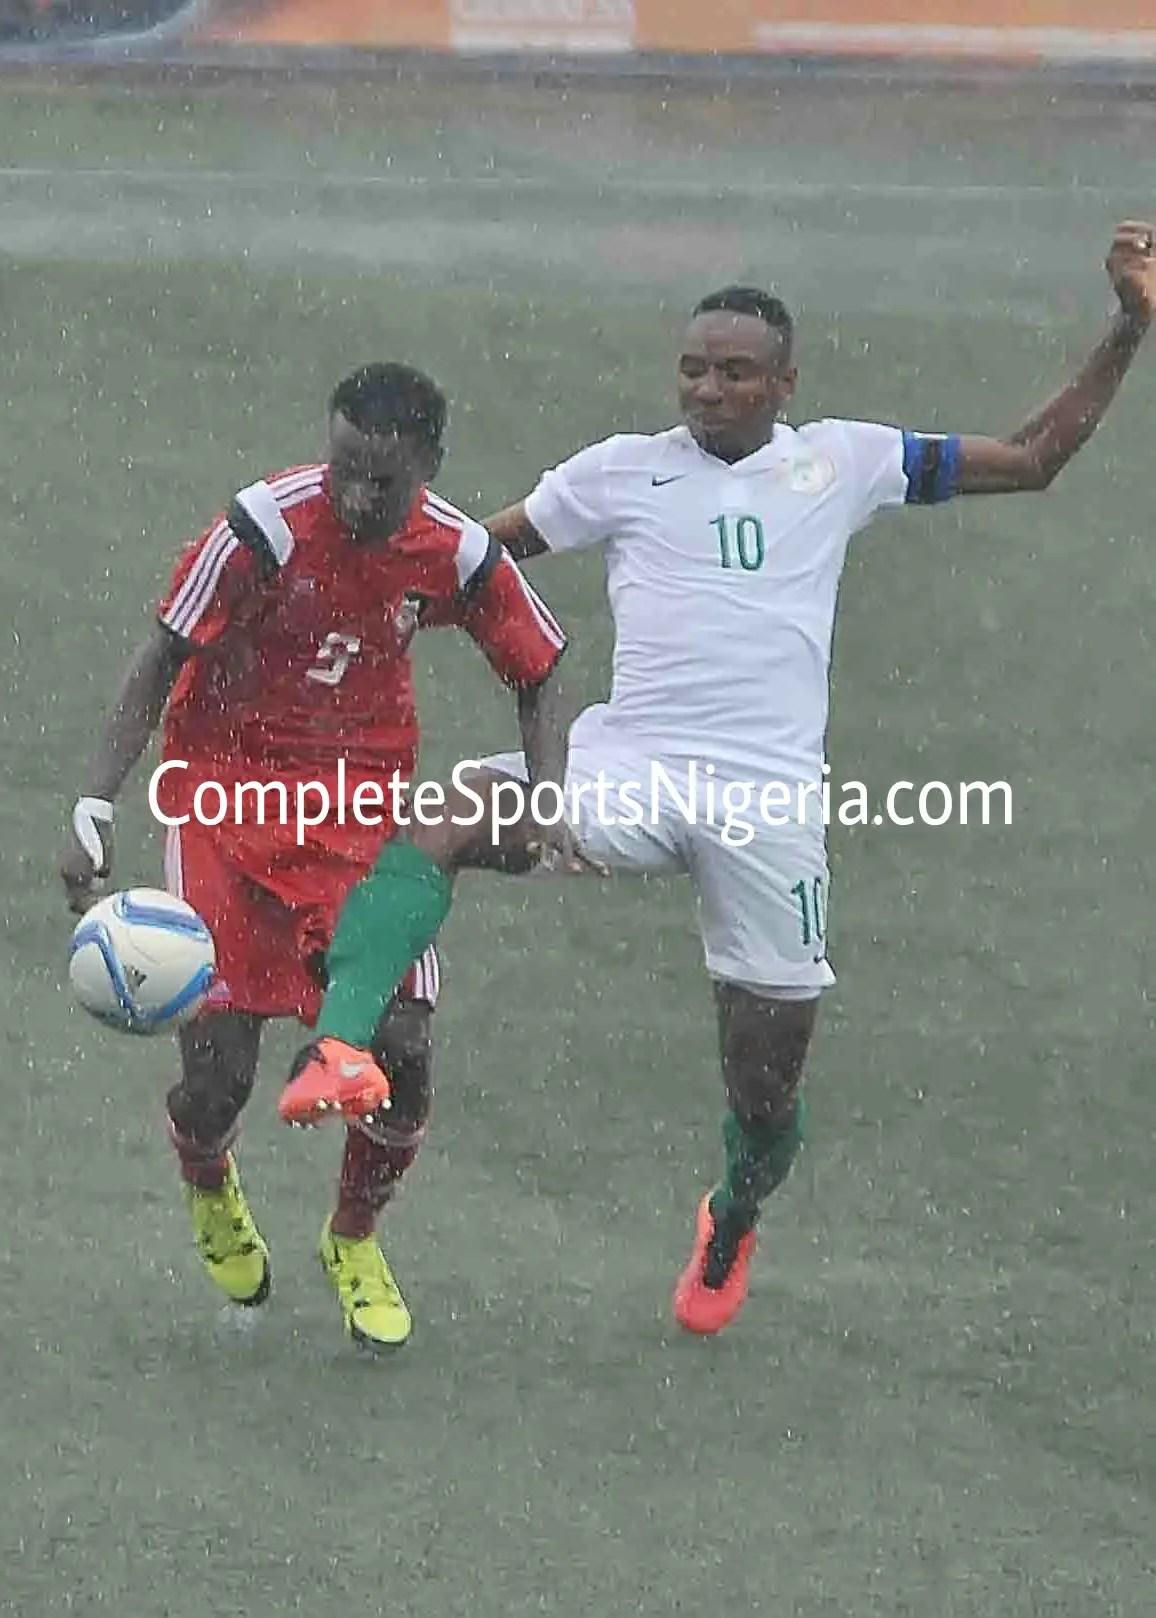 Sudan U-20 Star: We'll Beat Senegal Like We Beat Flying Eagles